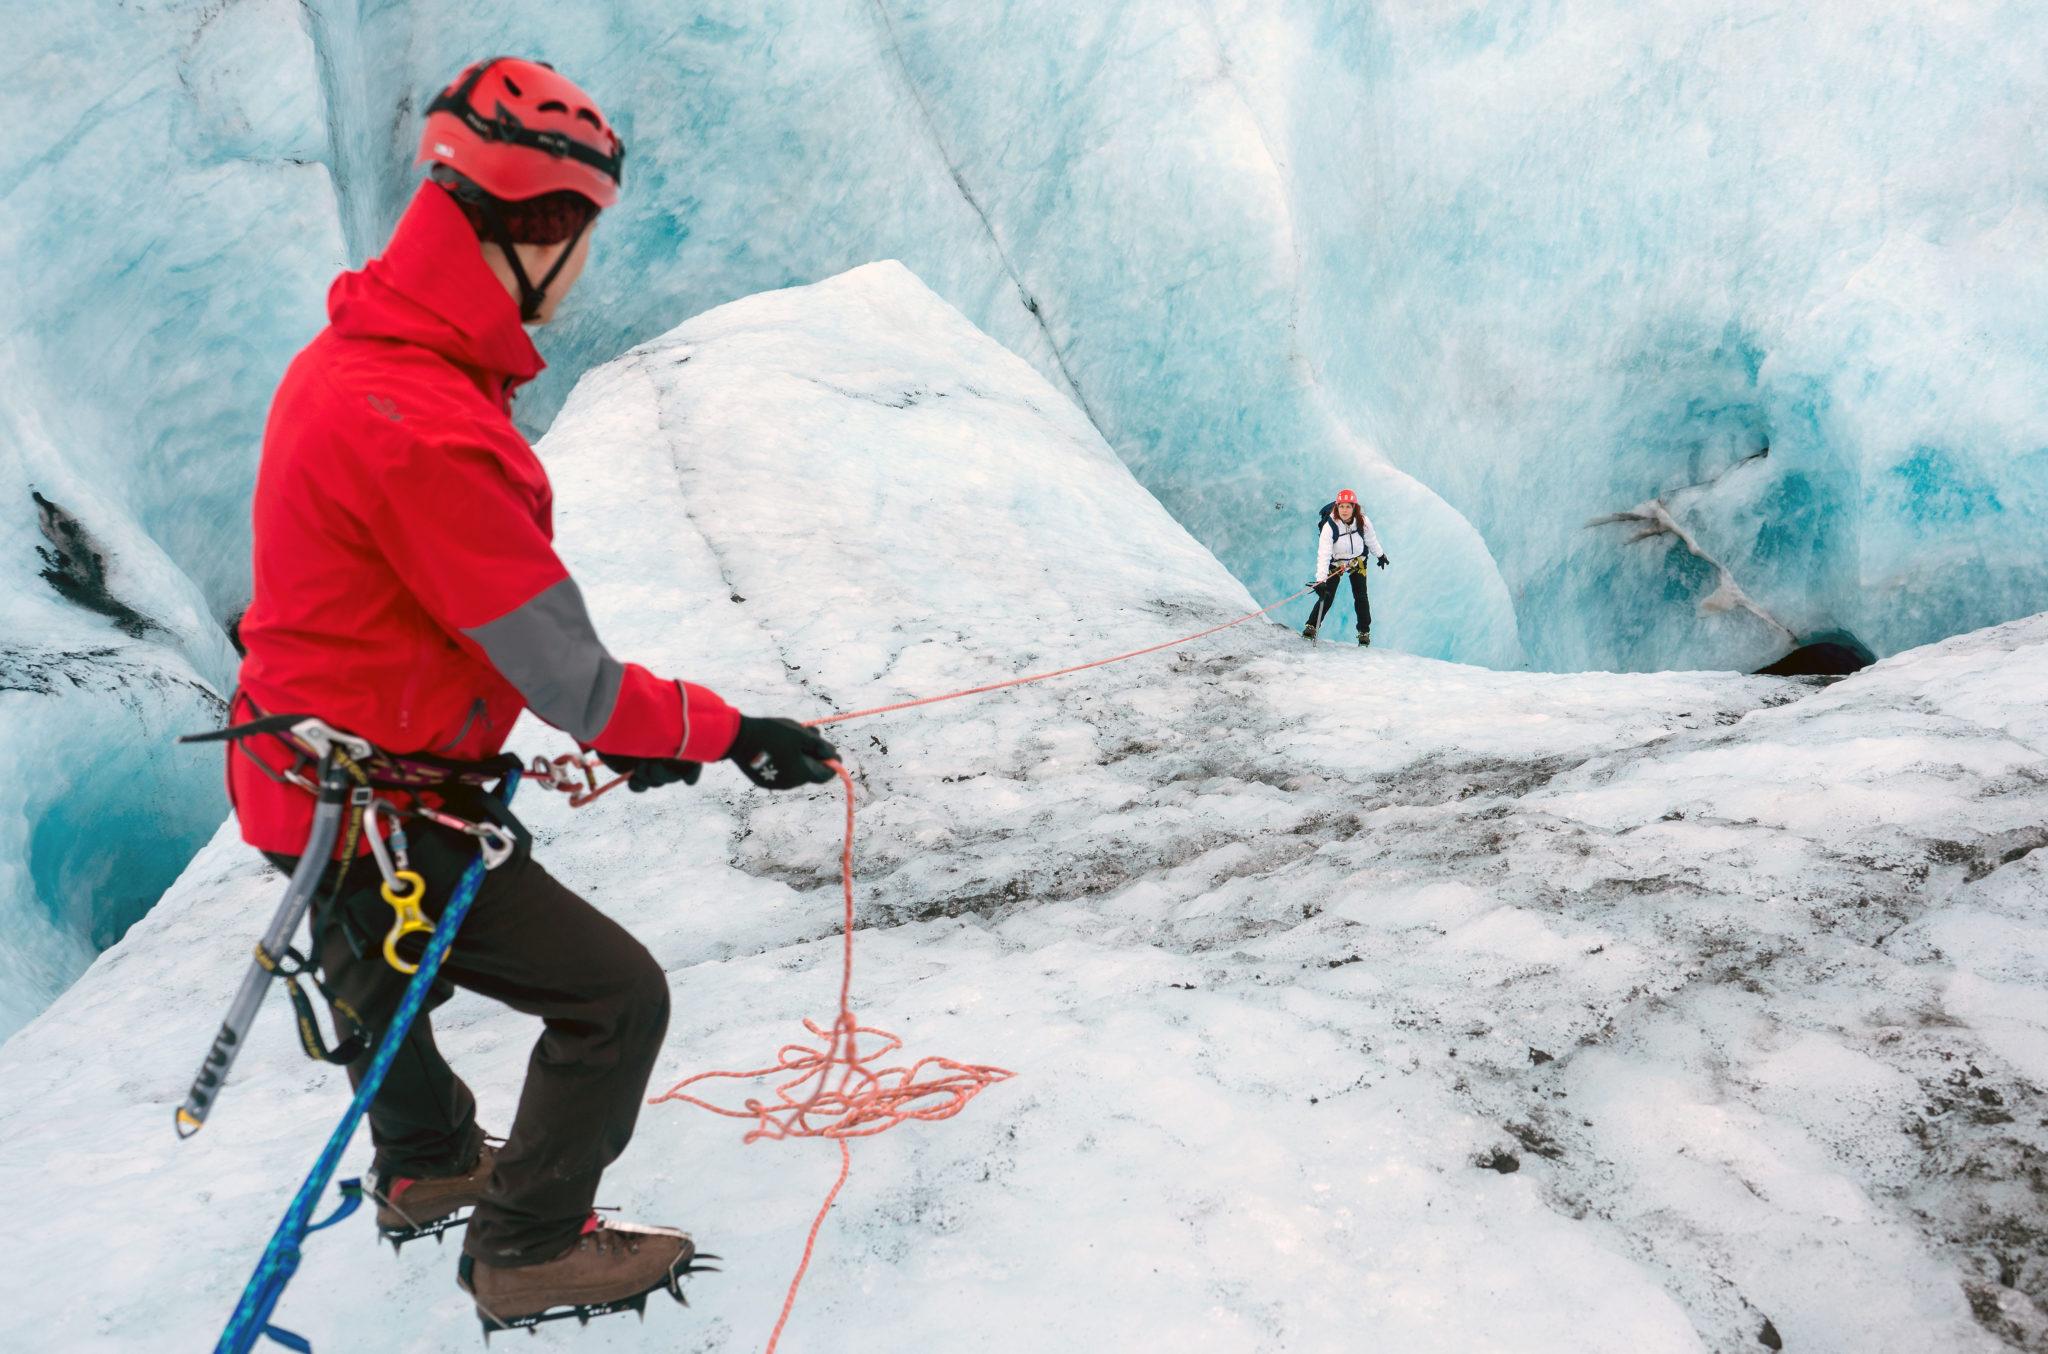 Arrampicata sul ghiacciaio di Eyjafjallajökull